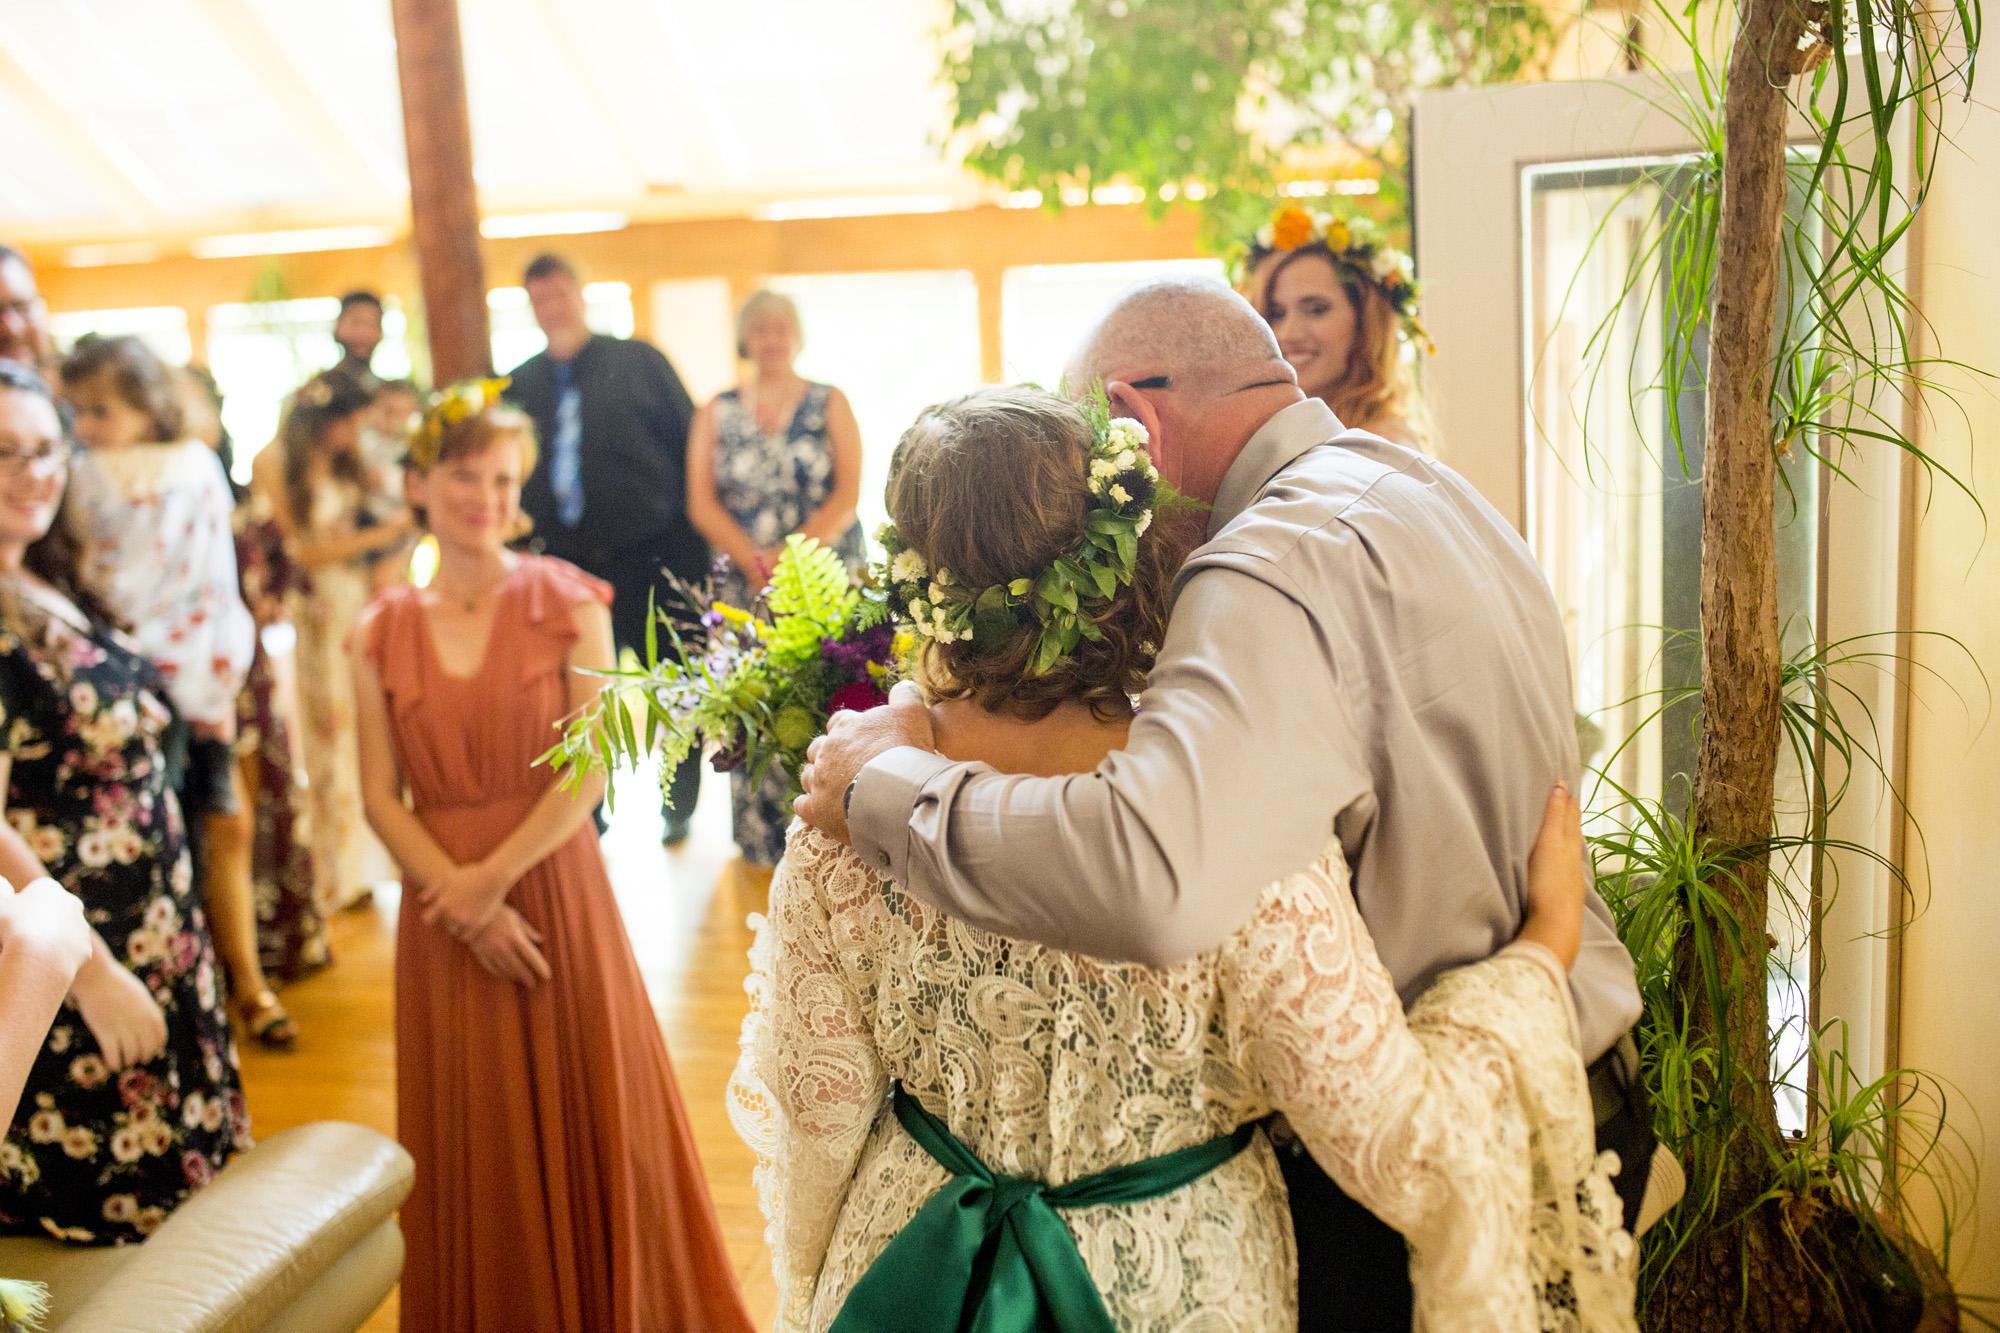 Seriously_Sabrina_Photography_Red_River_Gorge_Kentucky_Wedding_ShawnDana83.jpg